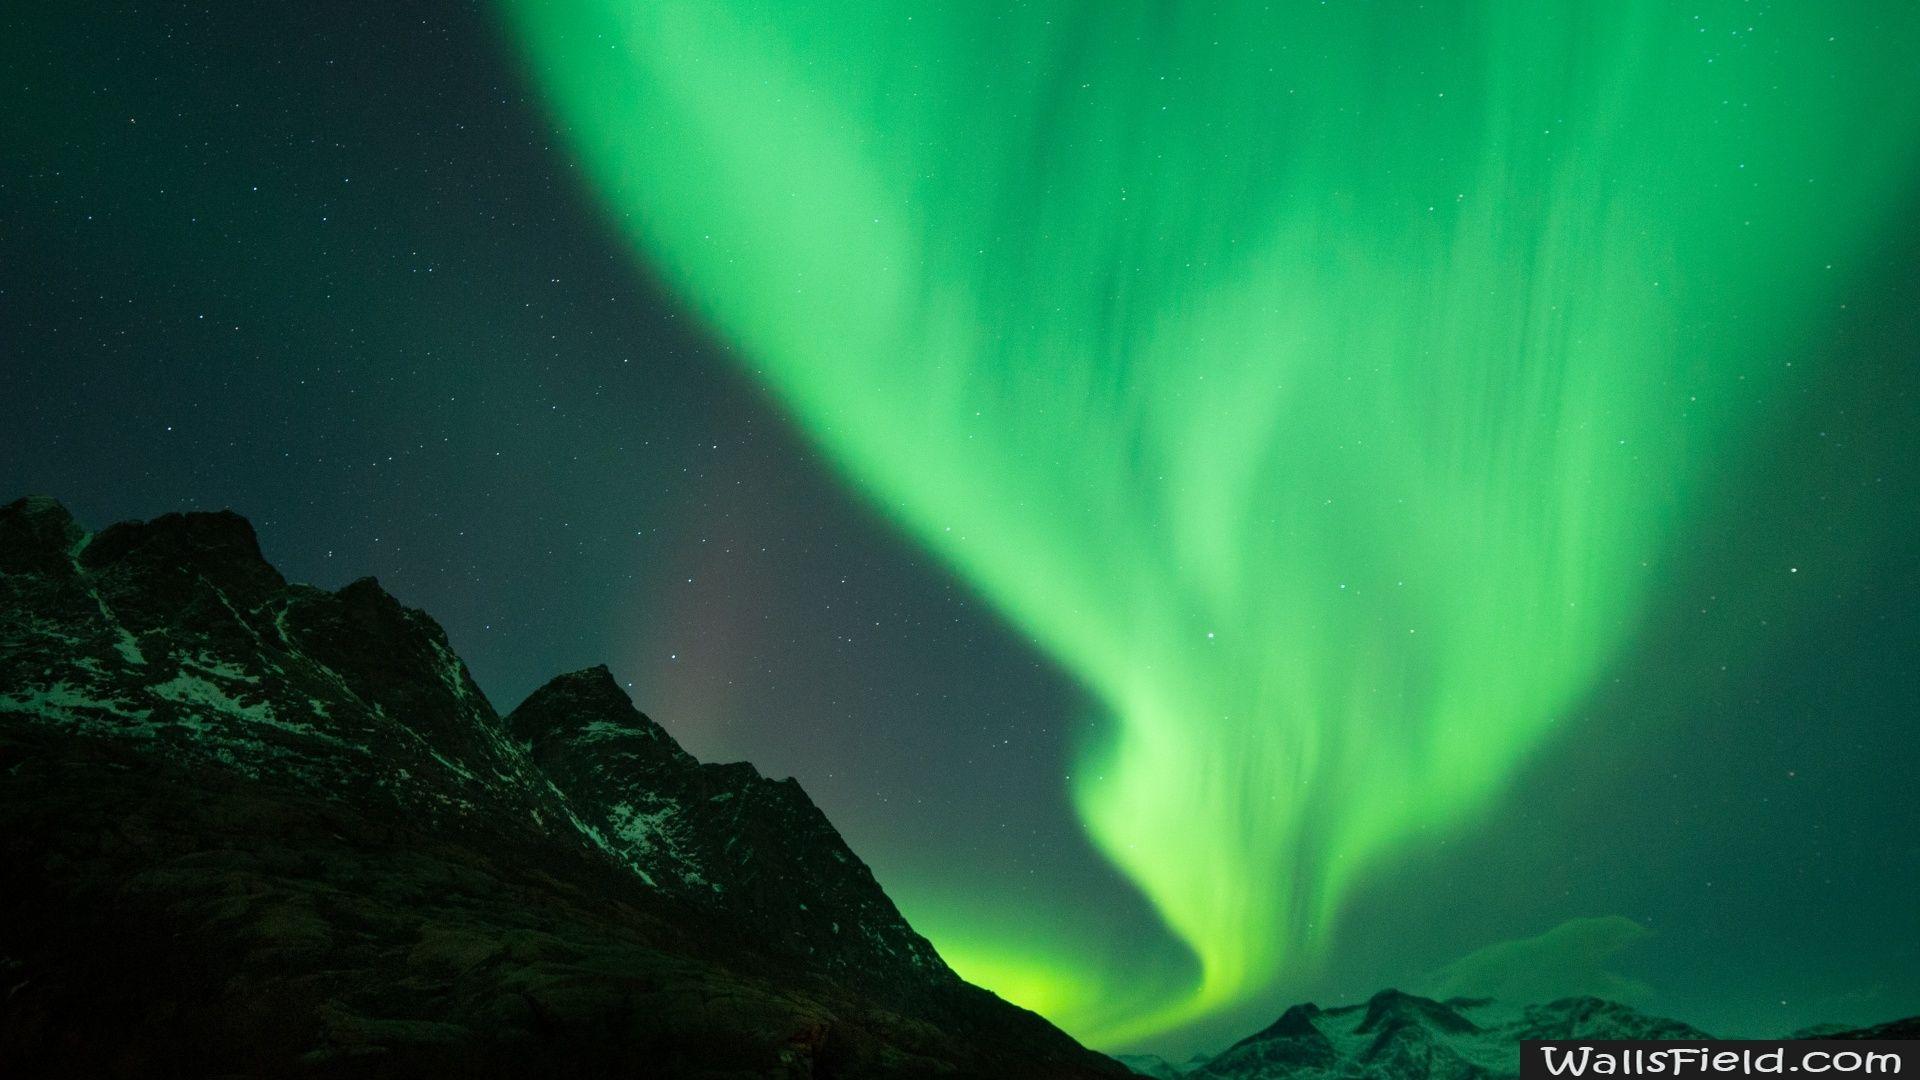 Polar Lights Photo Wallpaper